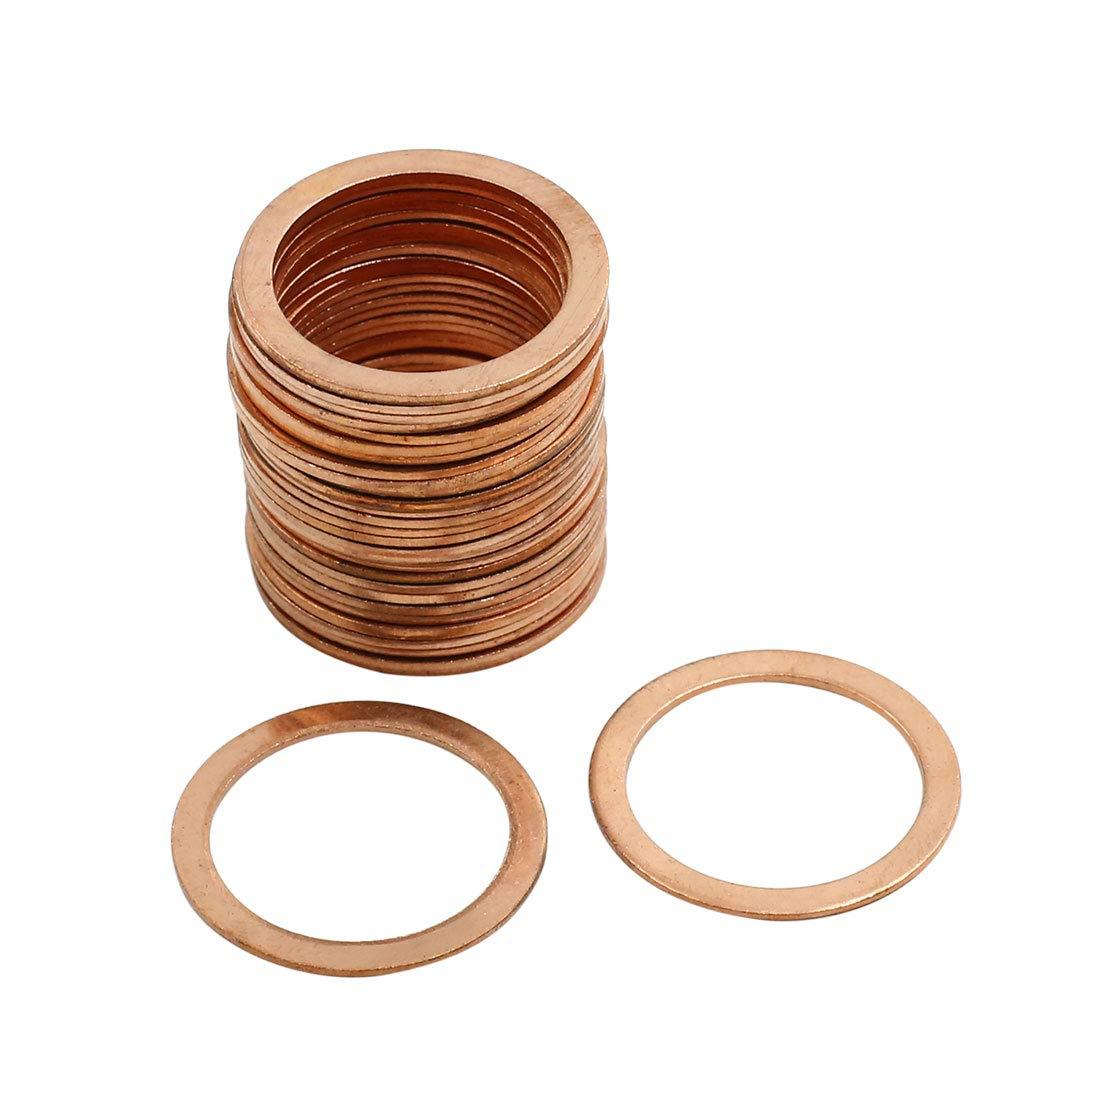 X AUTOHAUX 30 Pcs 22mm Inner Diameter Copper Washers Flat Sealing Gasket O-Shape Rings